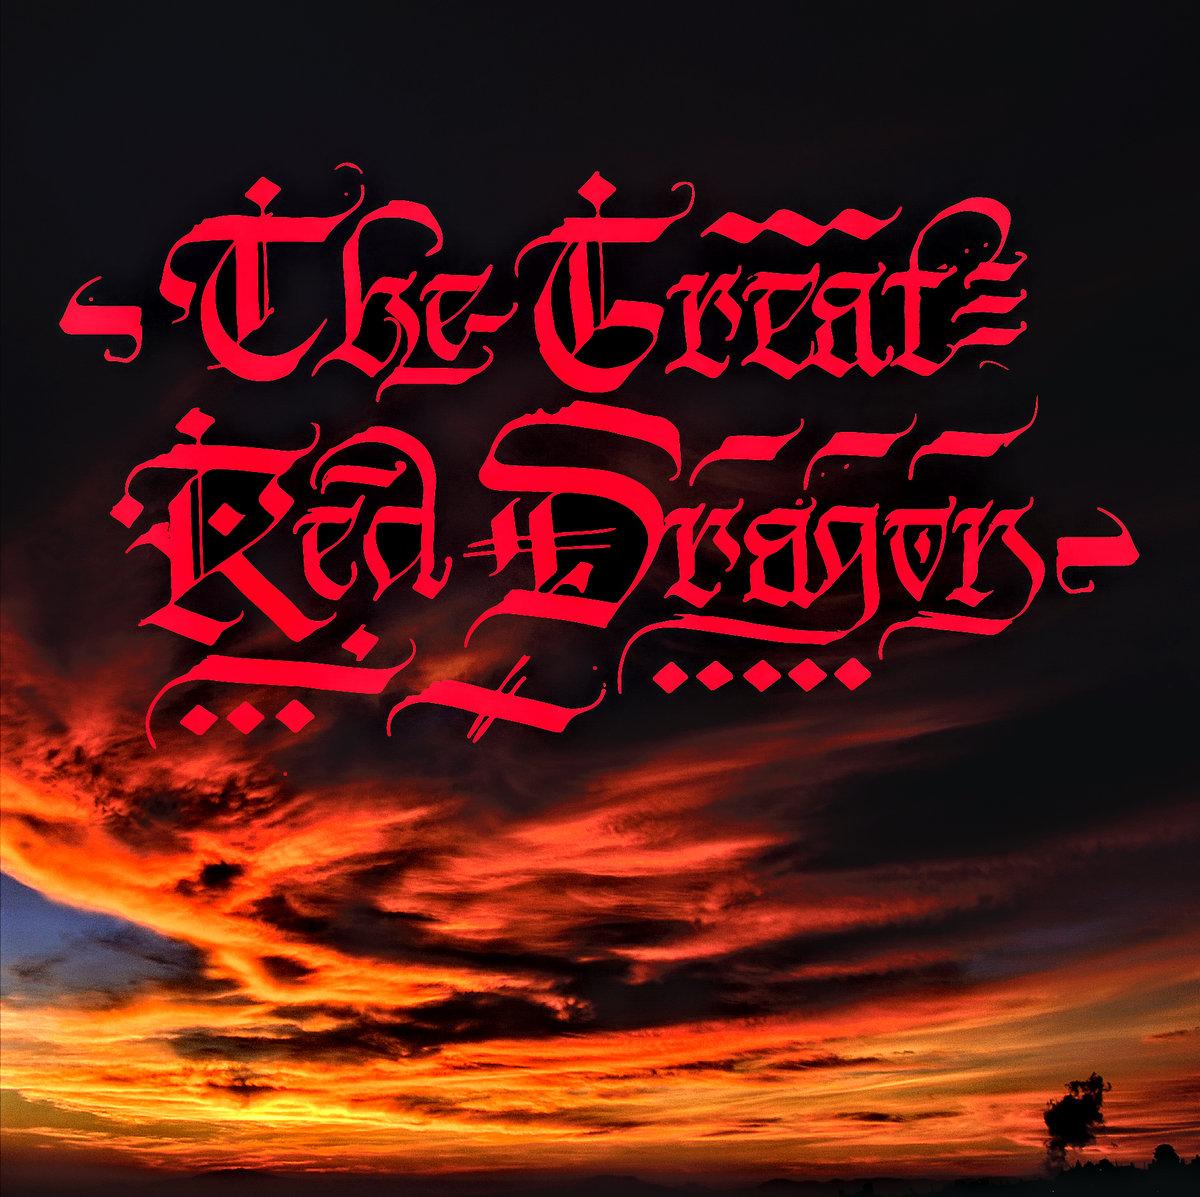 Álbum premiere y reseña: THE GREAT RED DRAGON.- 'The great reddragon'